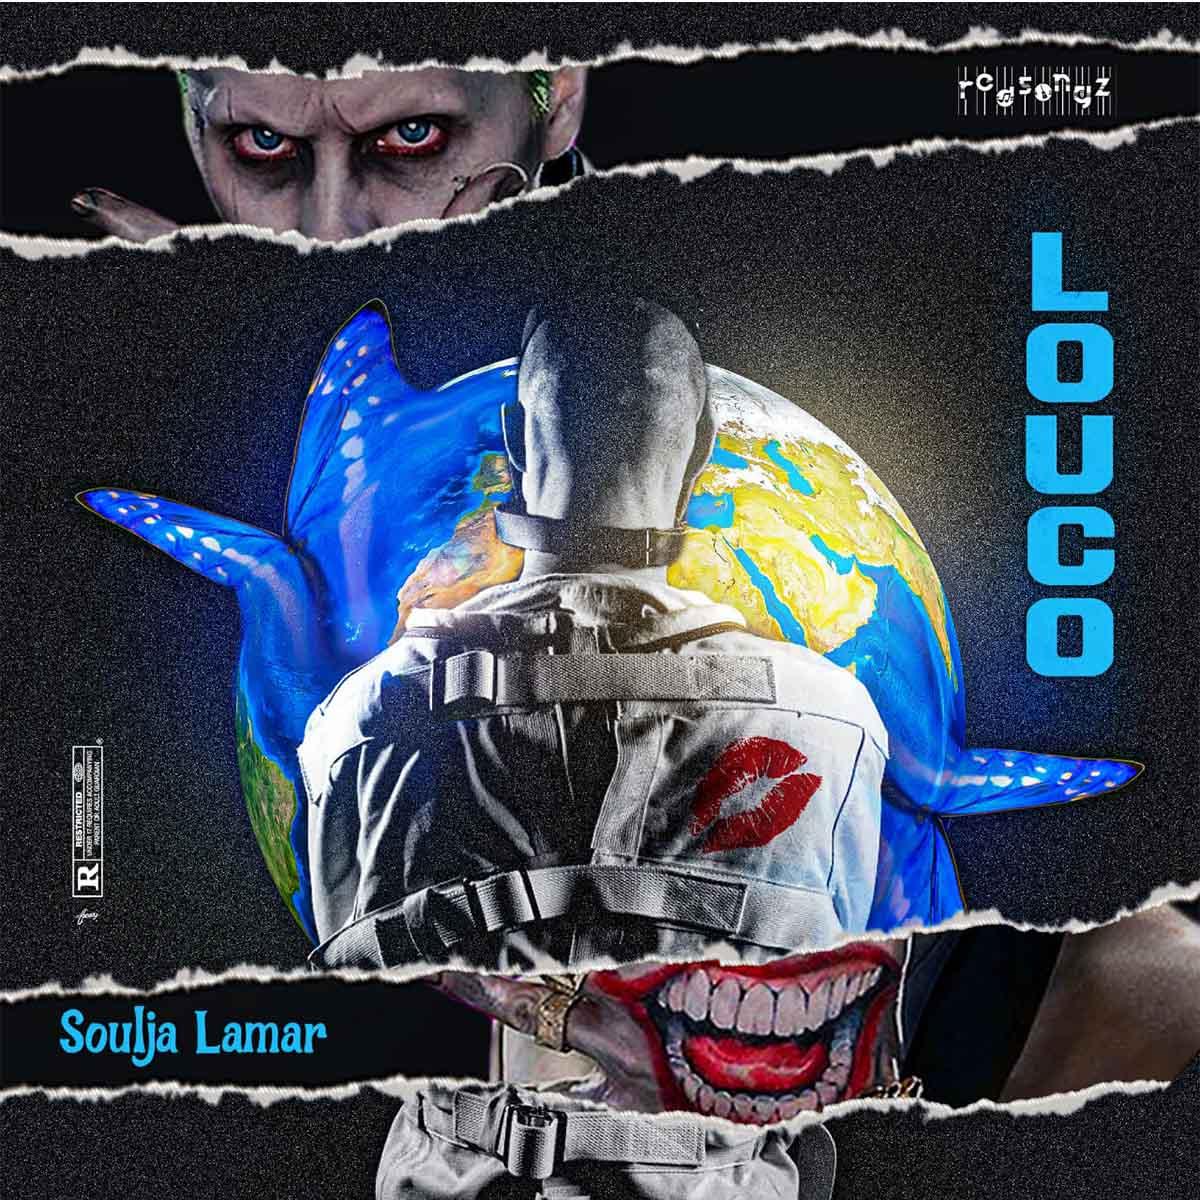 Soulja Lamar - Louco